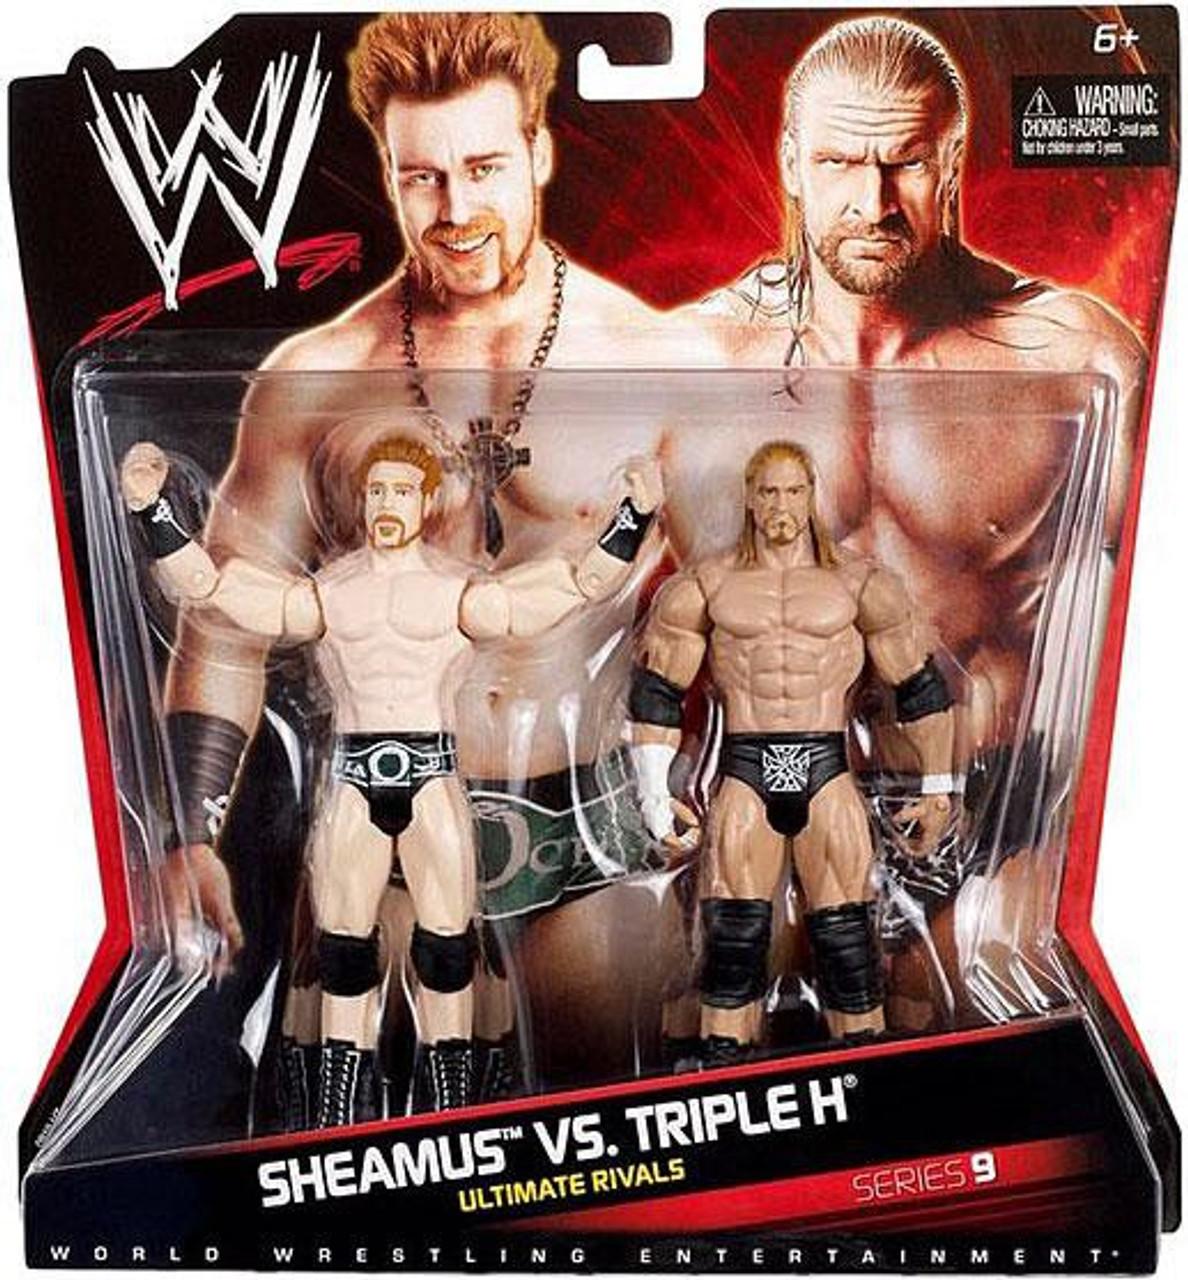 WWE Wrestling Series 9 Sheamus vs. Triple H Action Figure 2-Pack